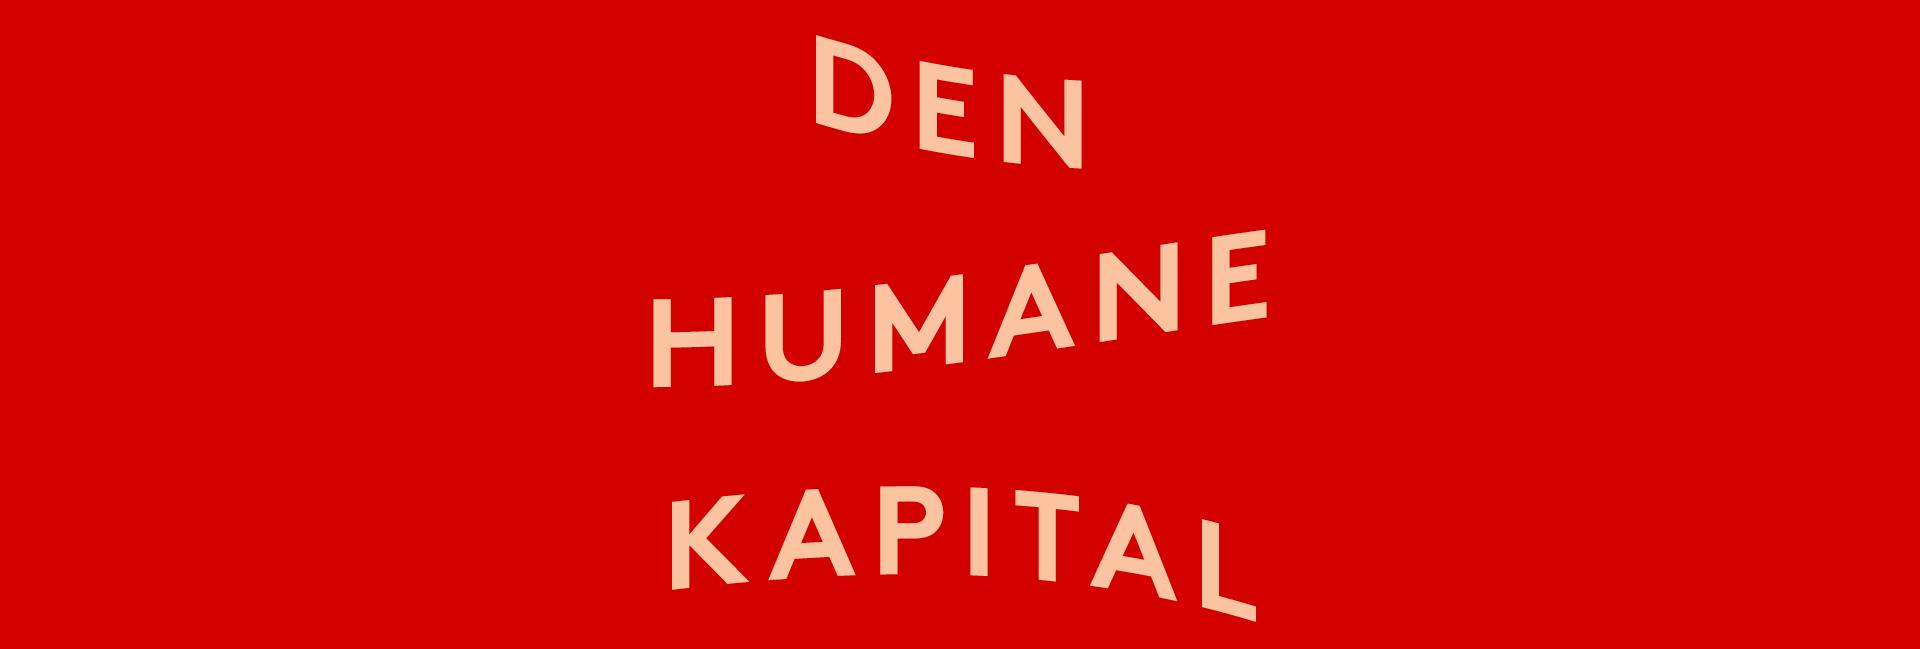 Den humane kapital